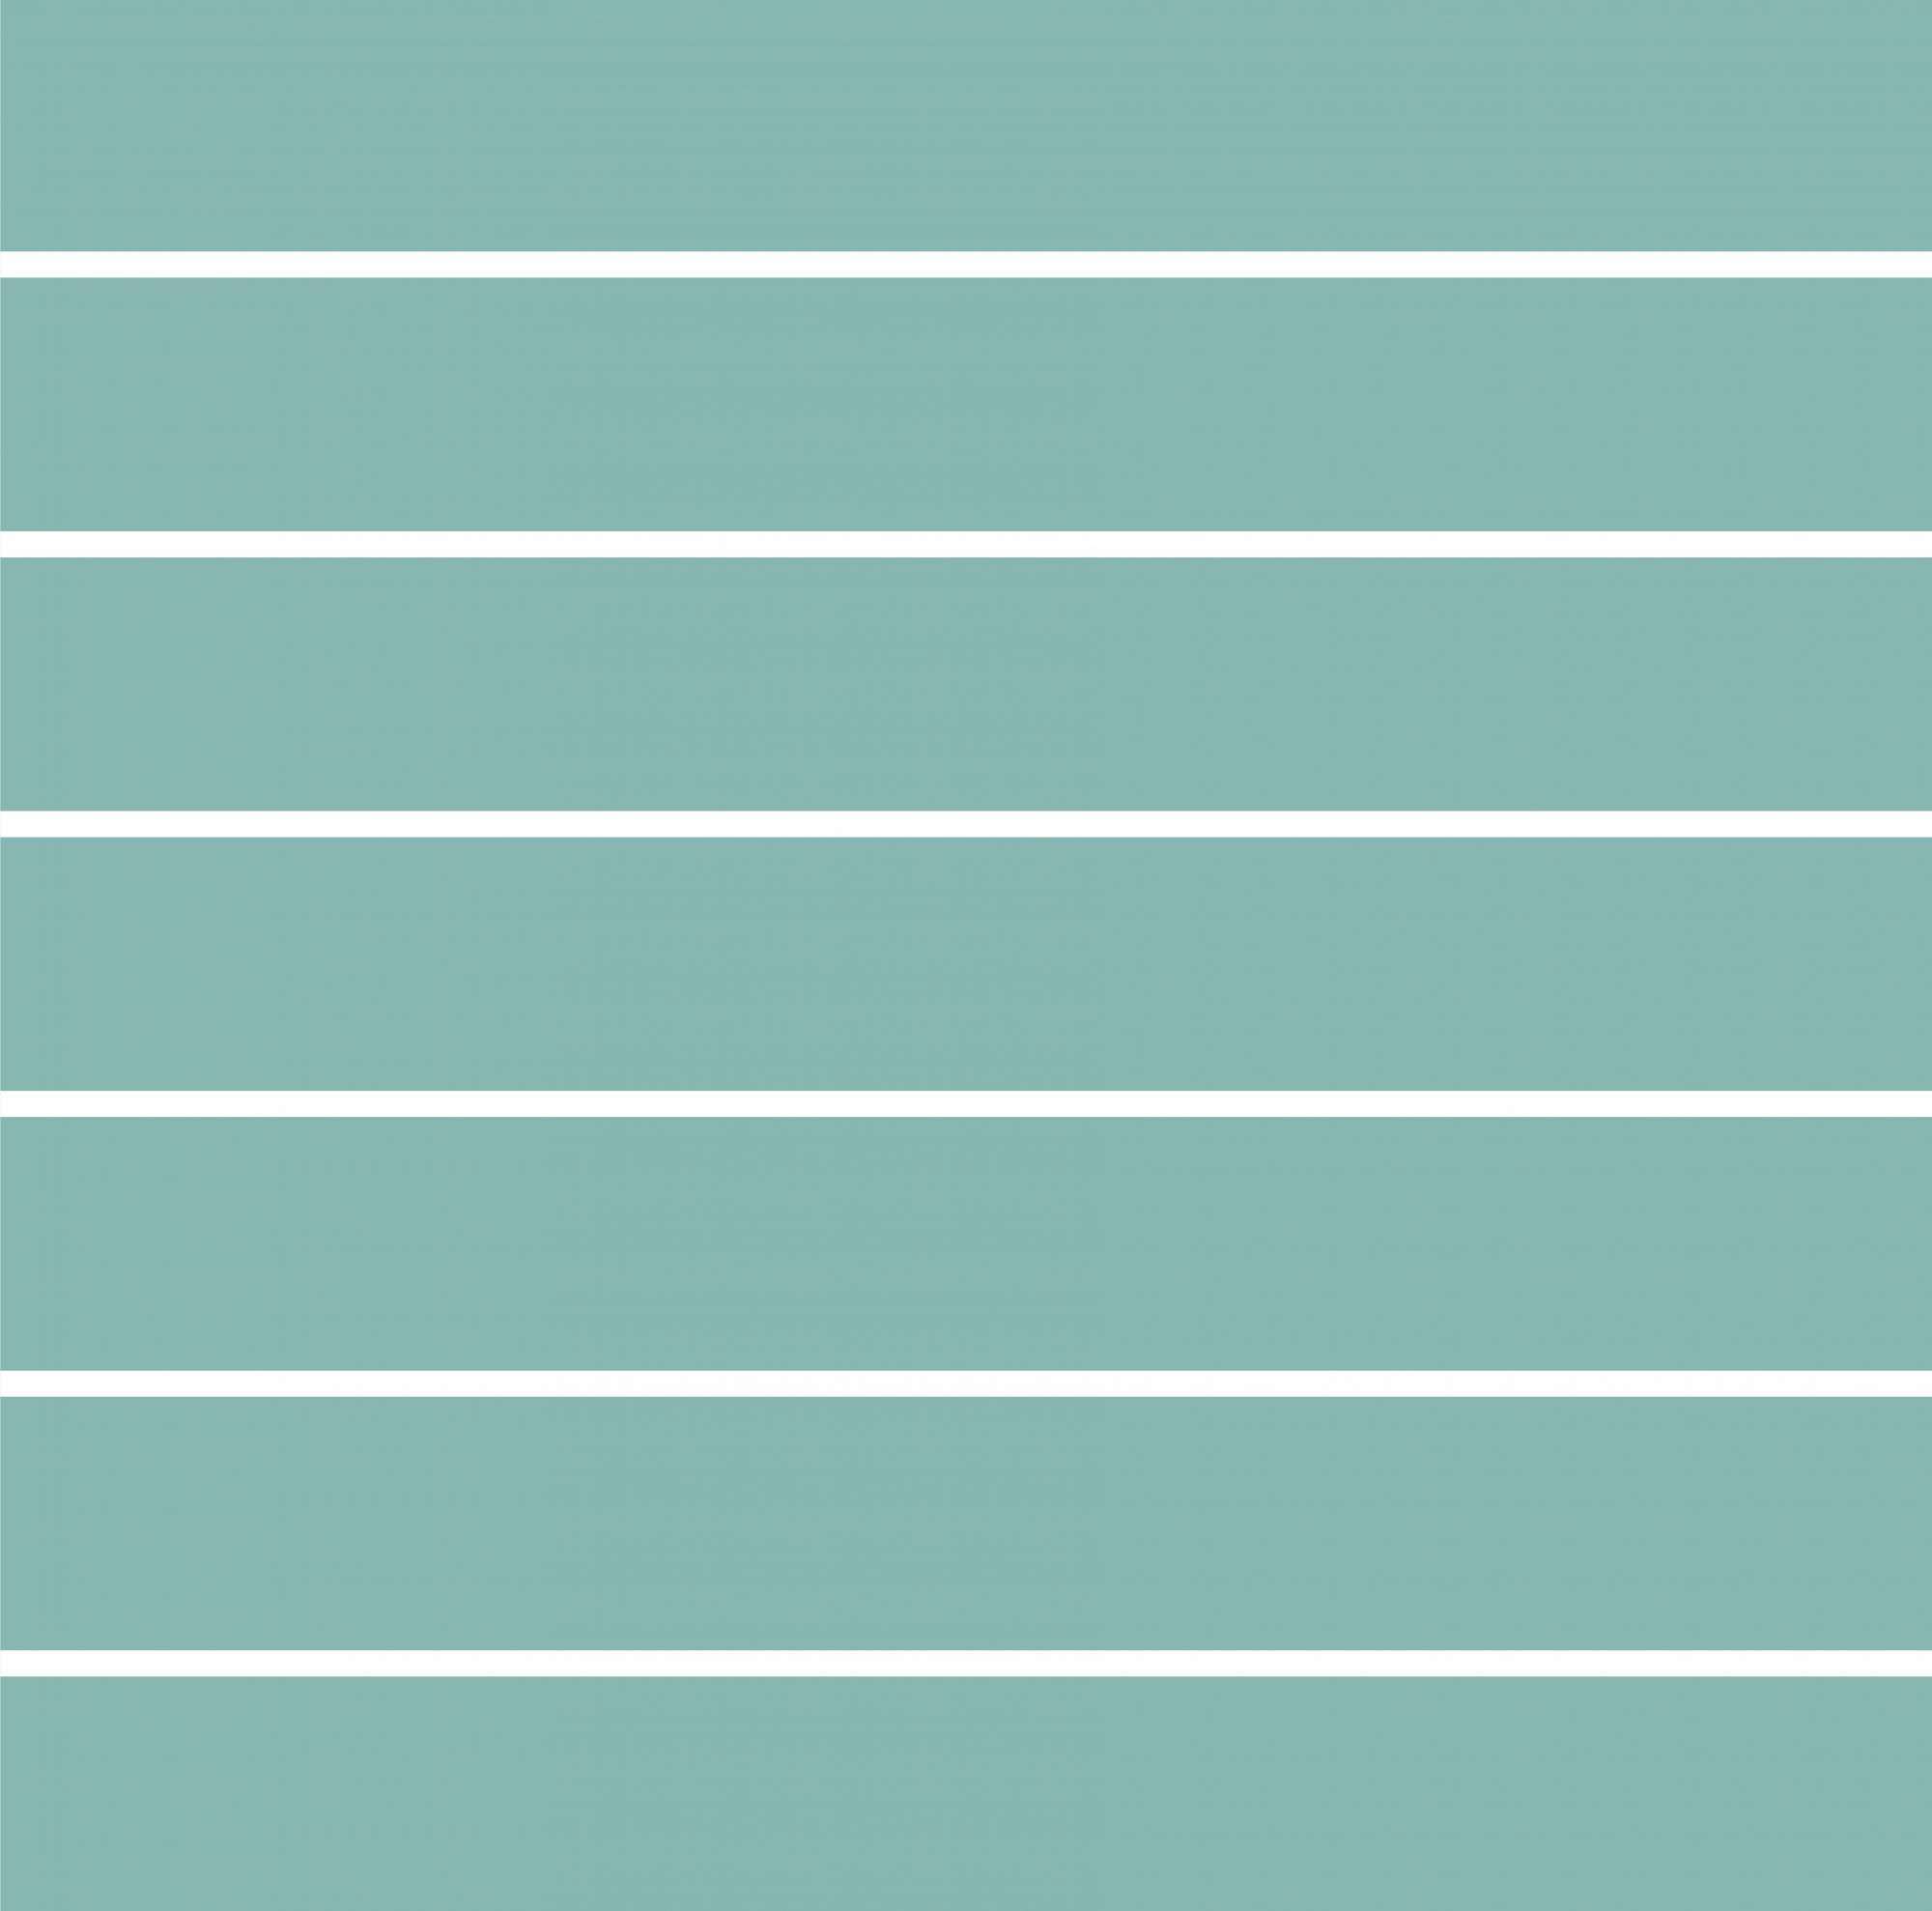 Papel de Parede ADESIVO - Listras verdes